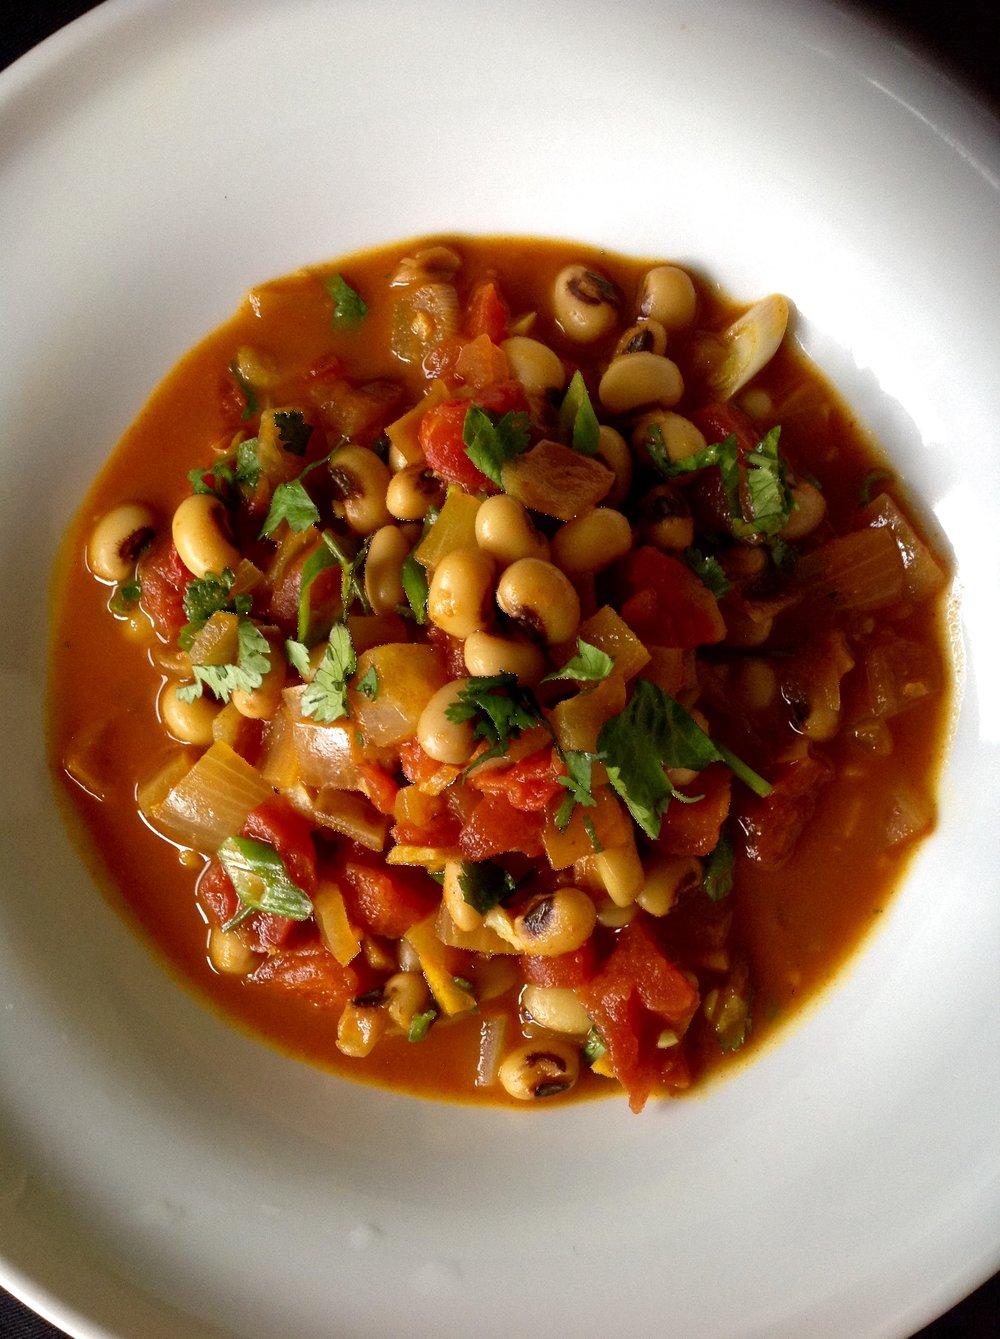 Ethiopian Berbere Black-Eyed Peas - Marcus Samuelsson Healthy, Gluten-Free, Oil-Free, Plant-Based, Vegan